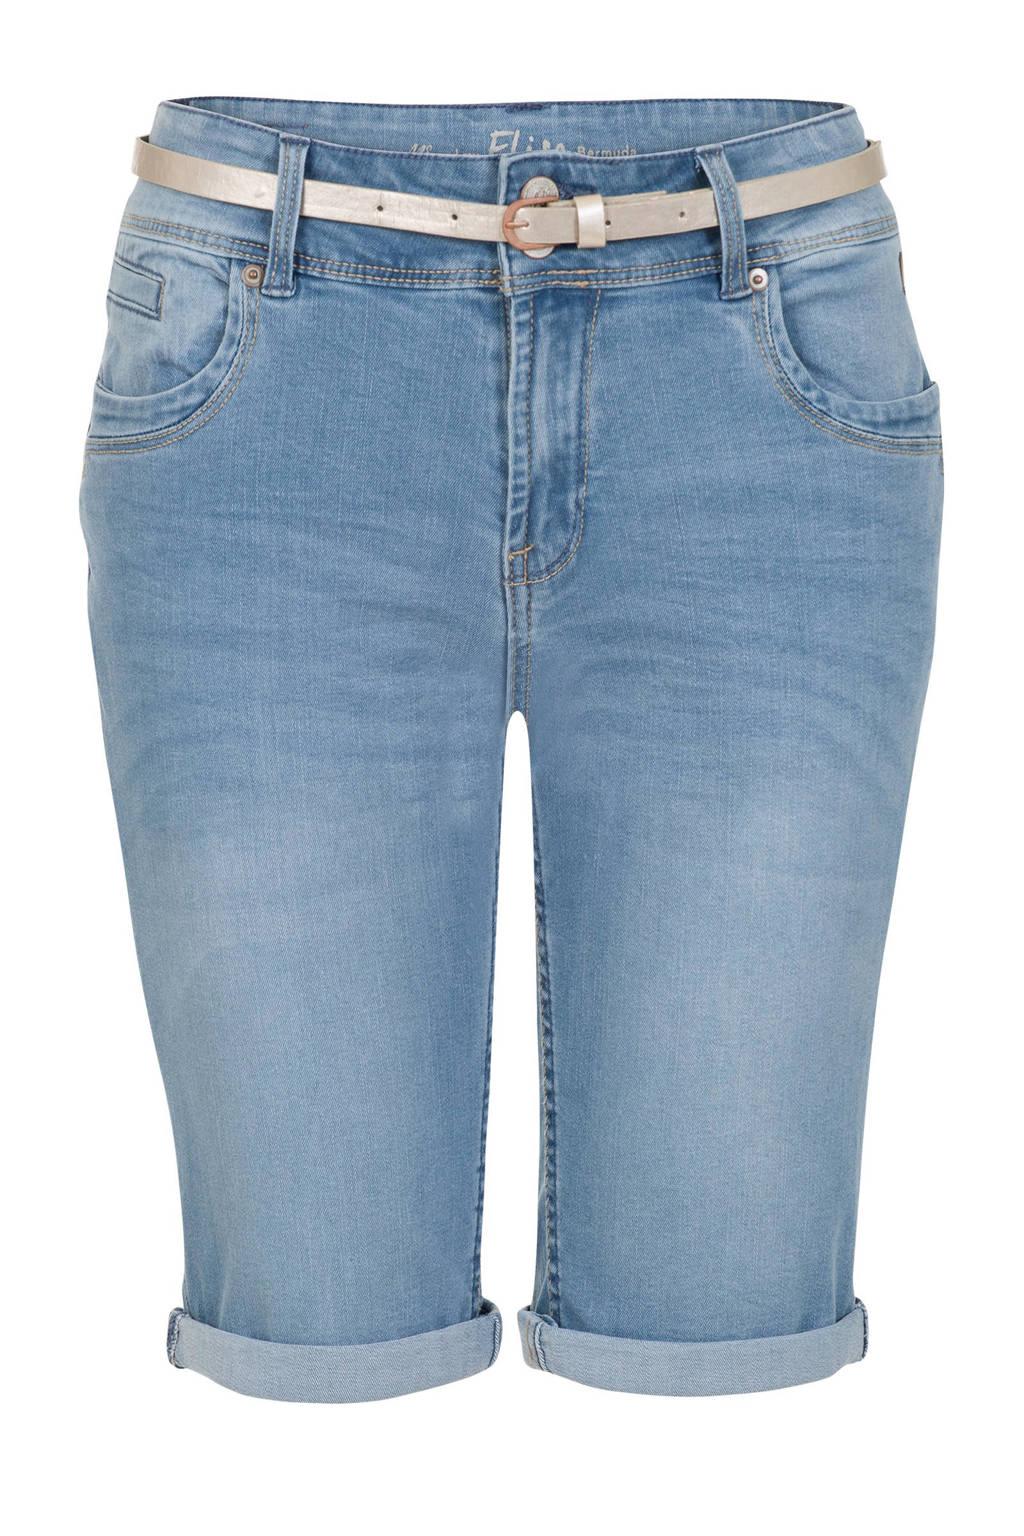 Miss Etam Regulier jeans short, Light denim